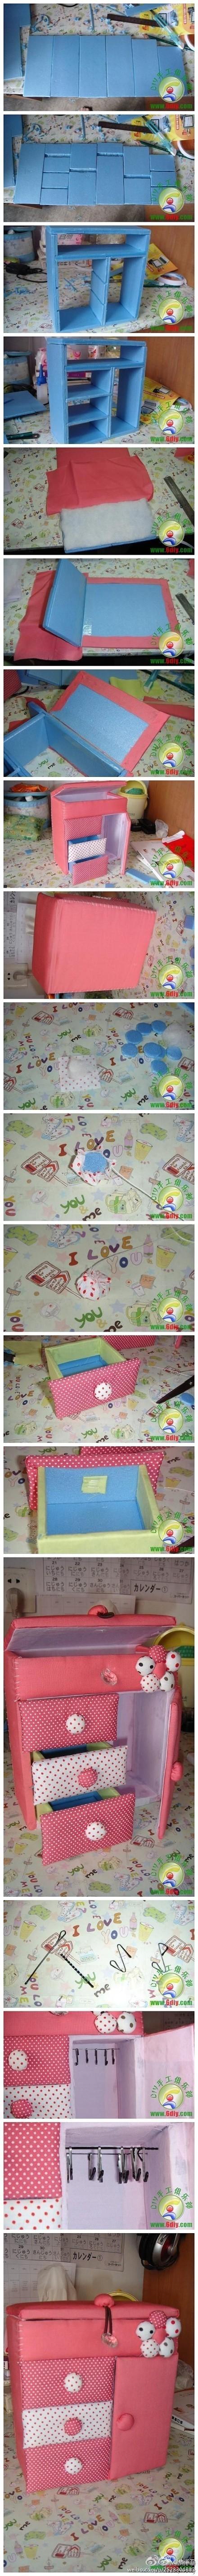 diy, cute, toy, dresser, tutorial, handmade